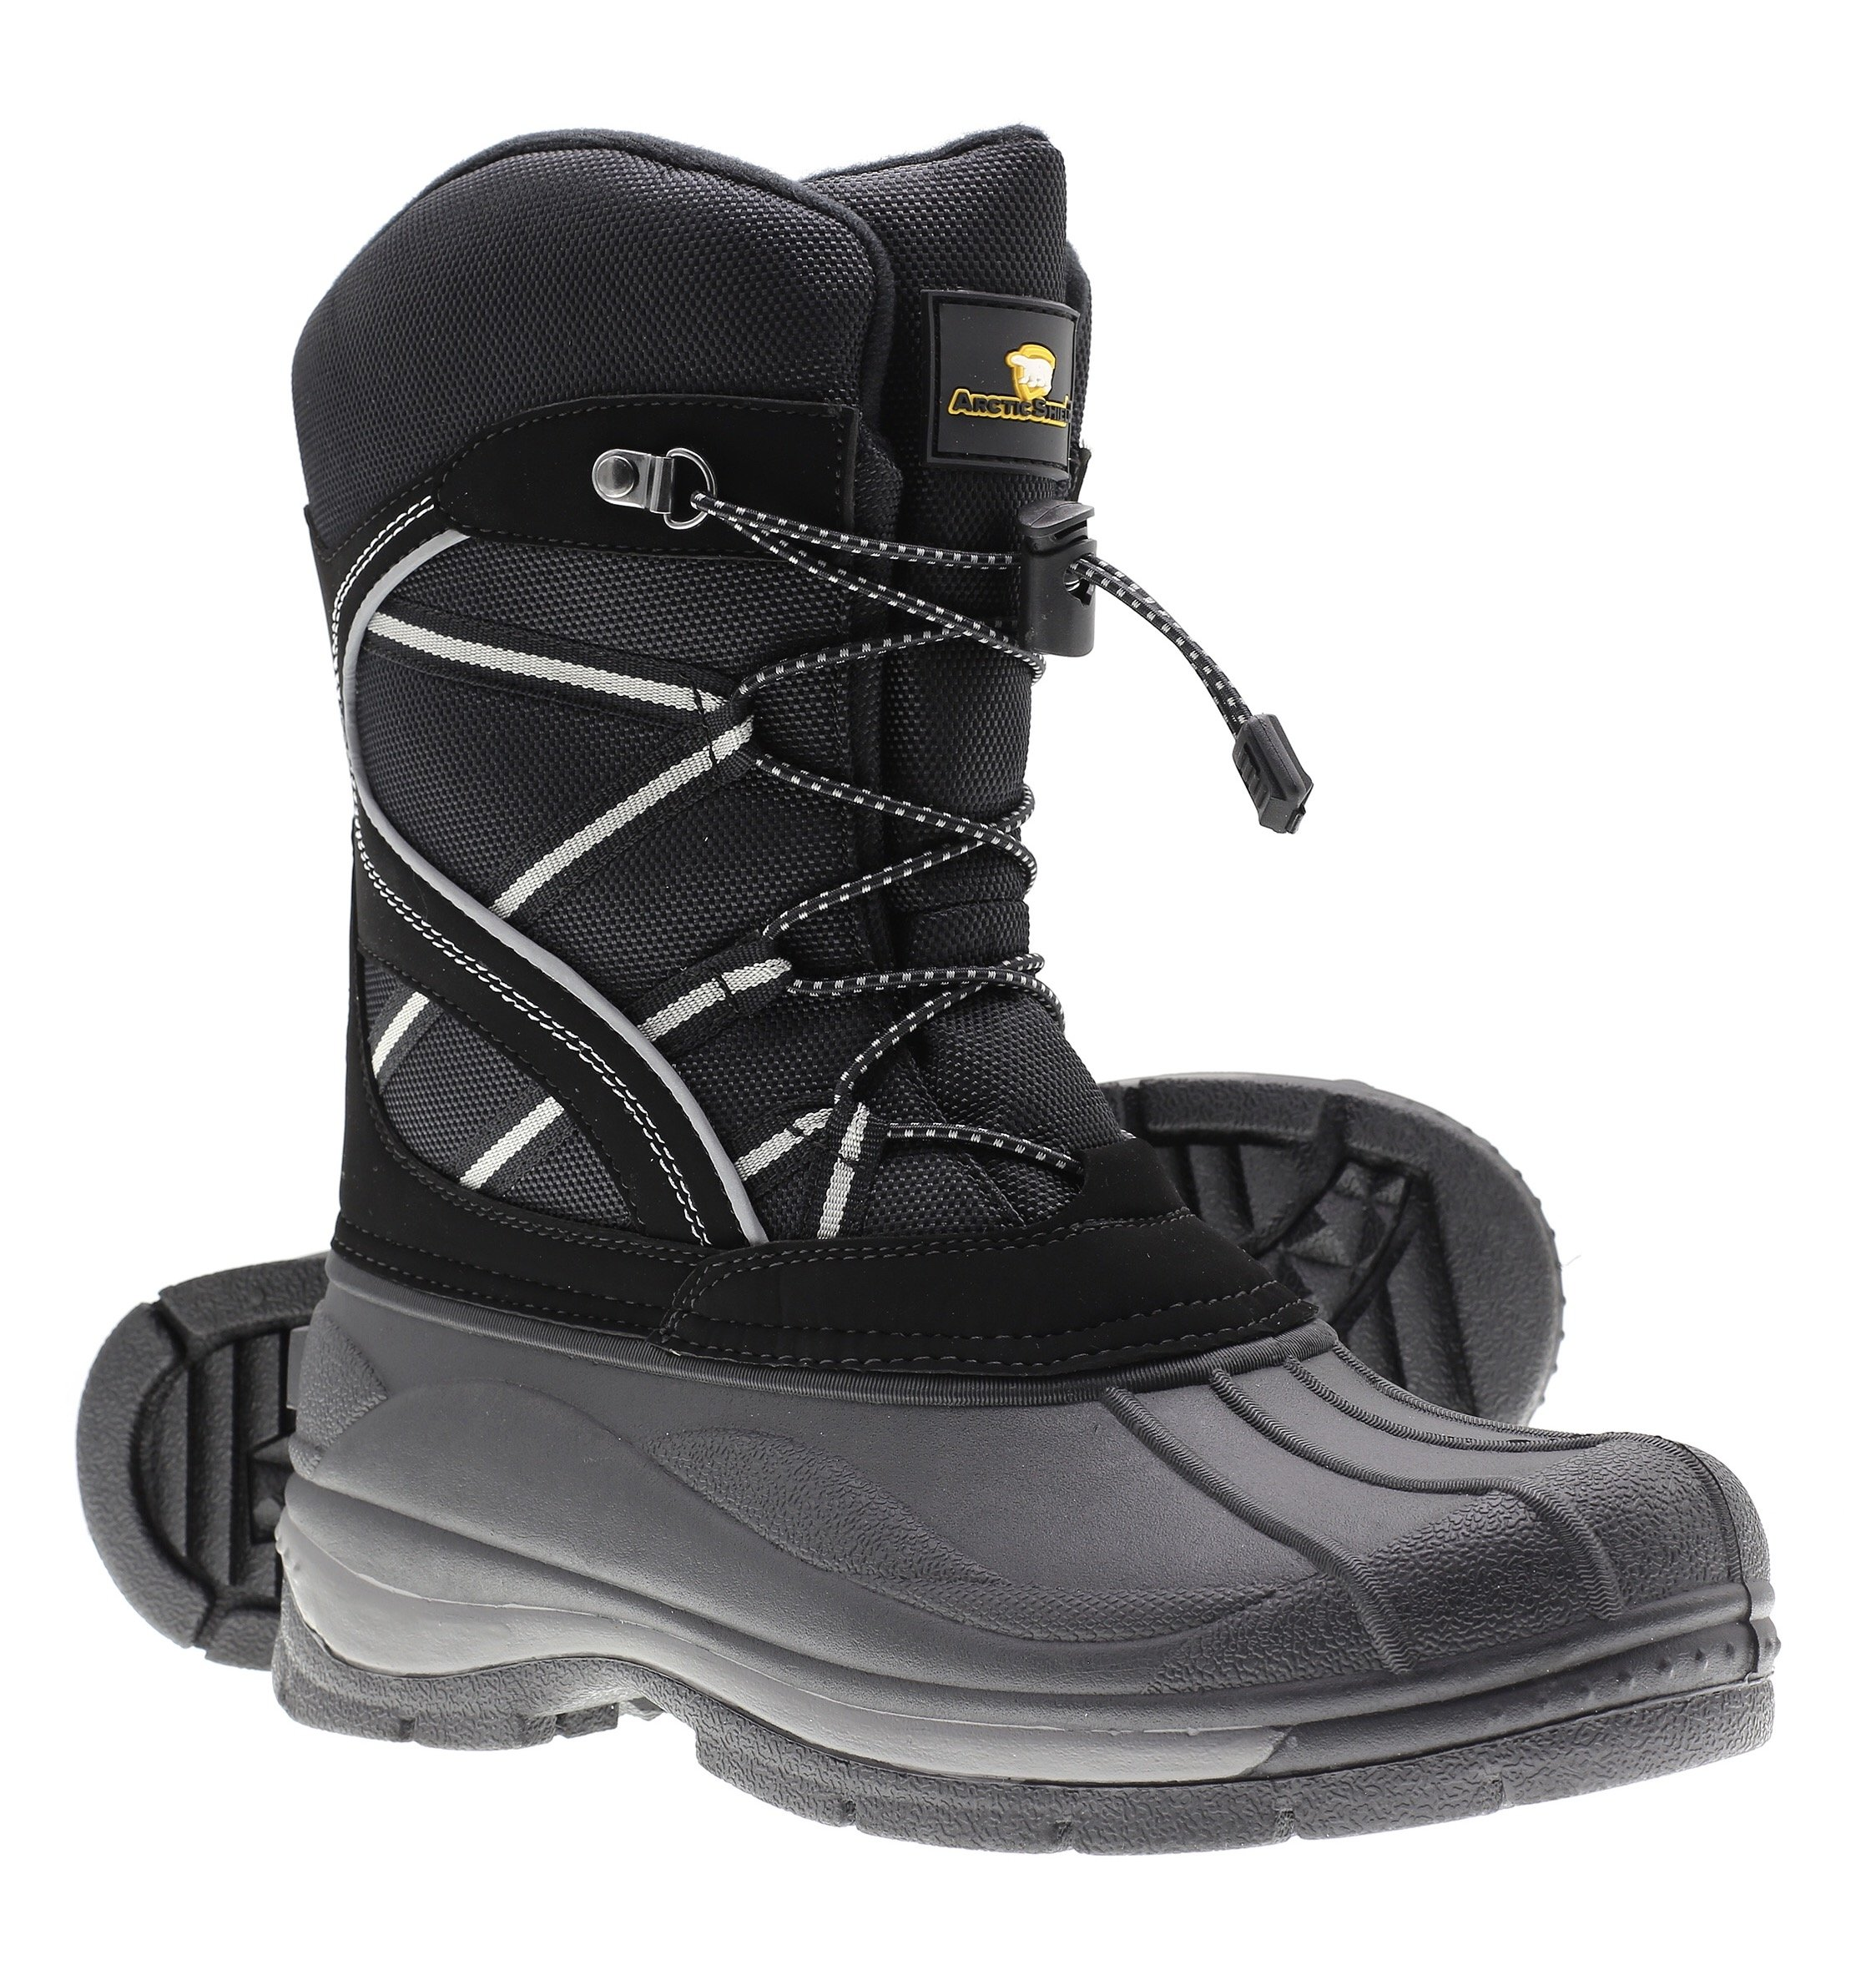 Arctic Shield Mens Warm Comfortable Waterproof Durable Outdoor Winter Snow Boots (9) by ArcticShield